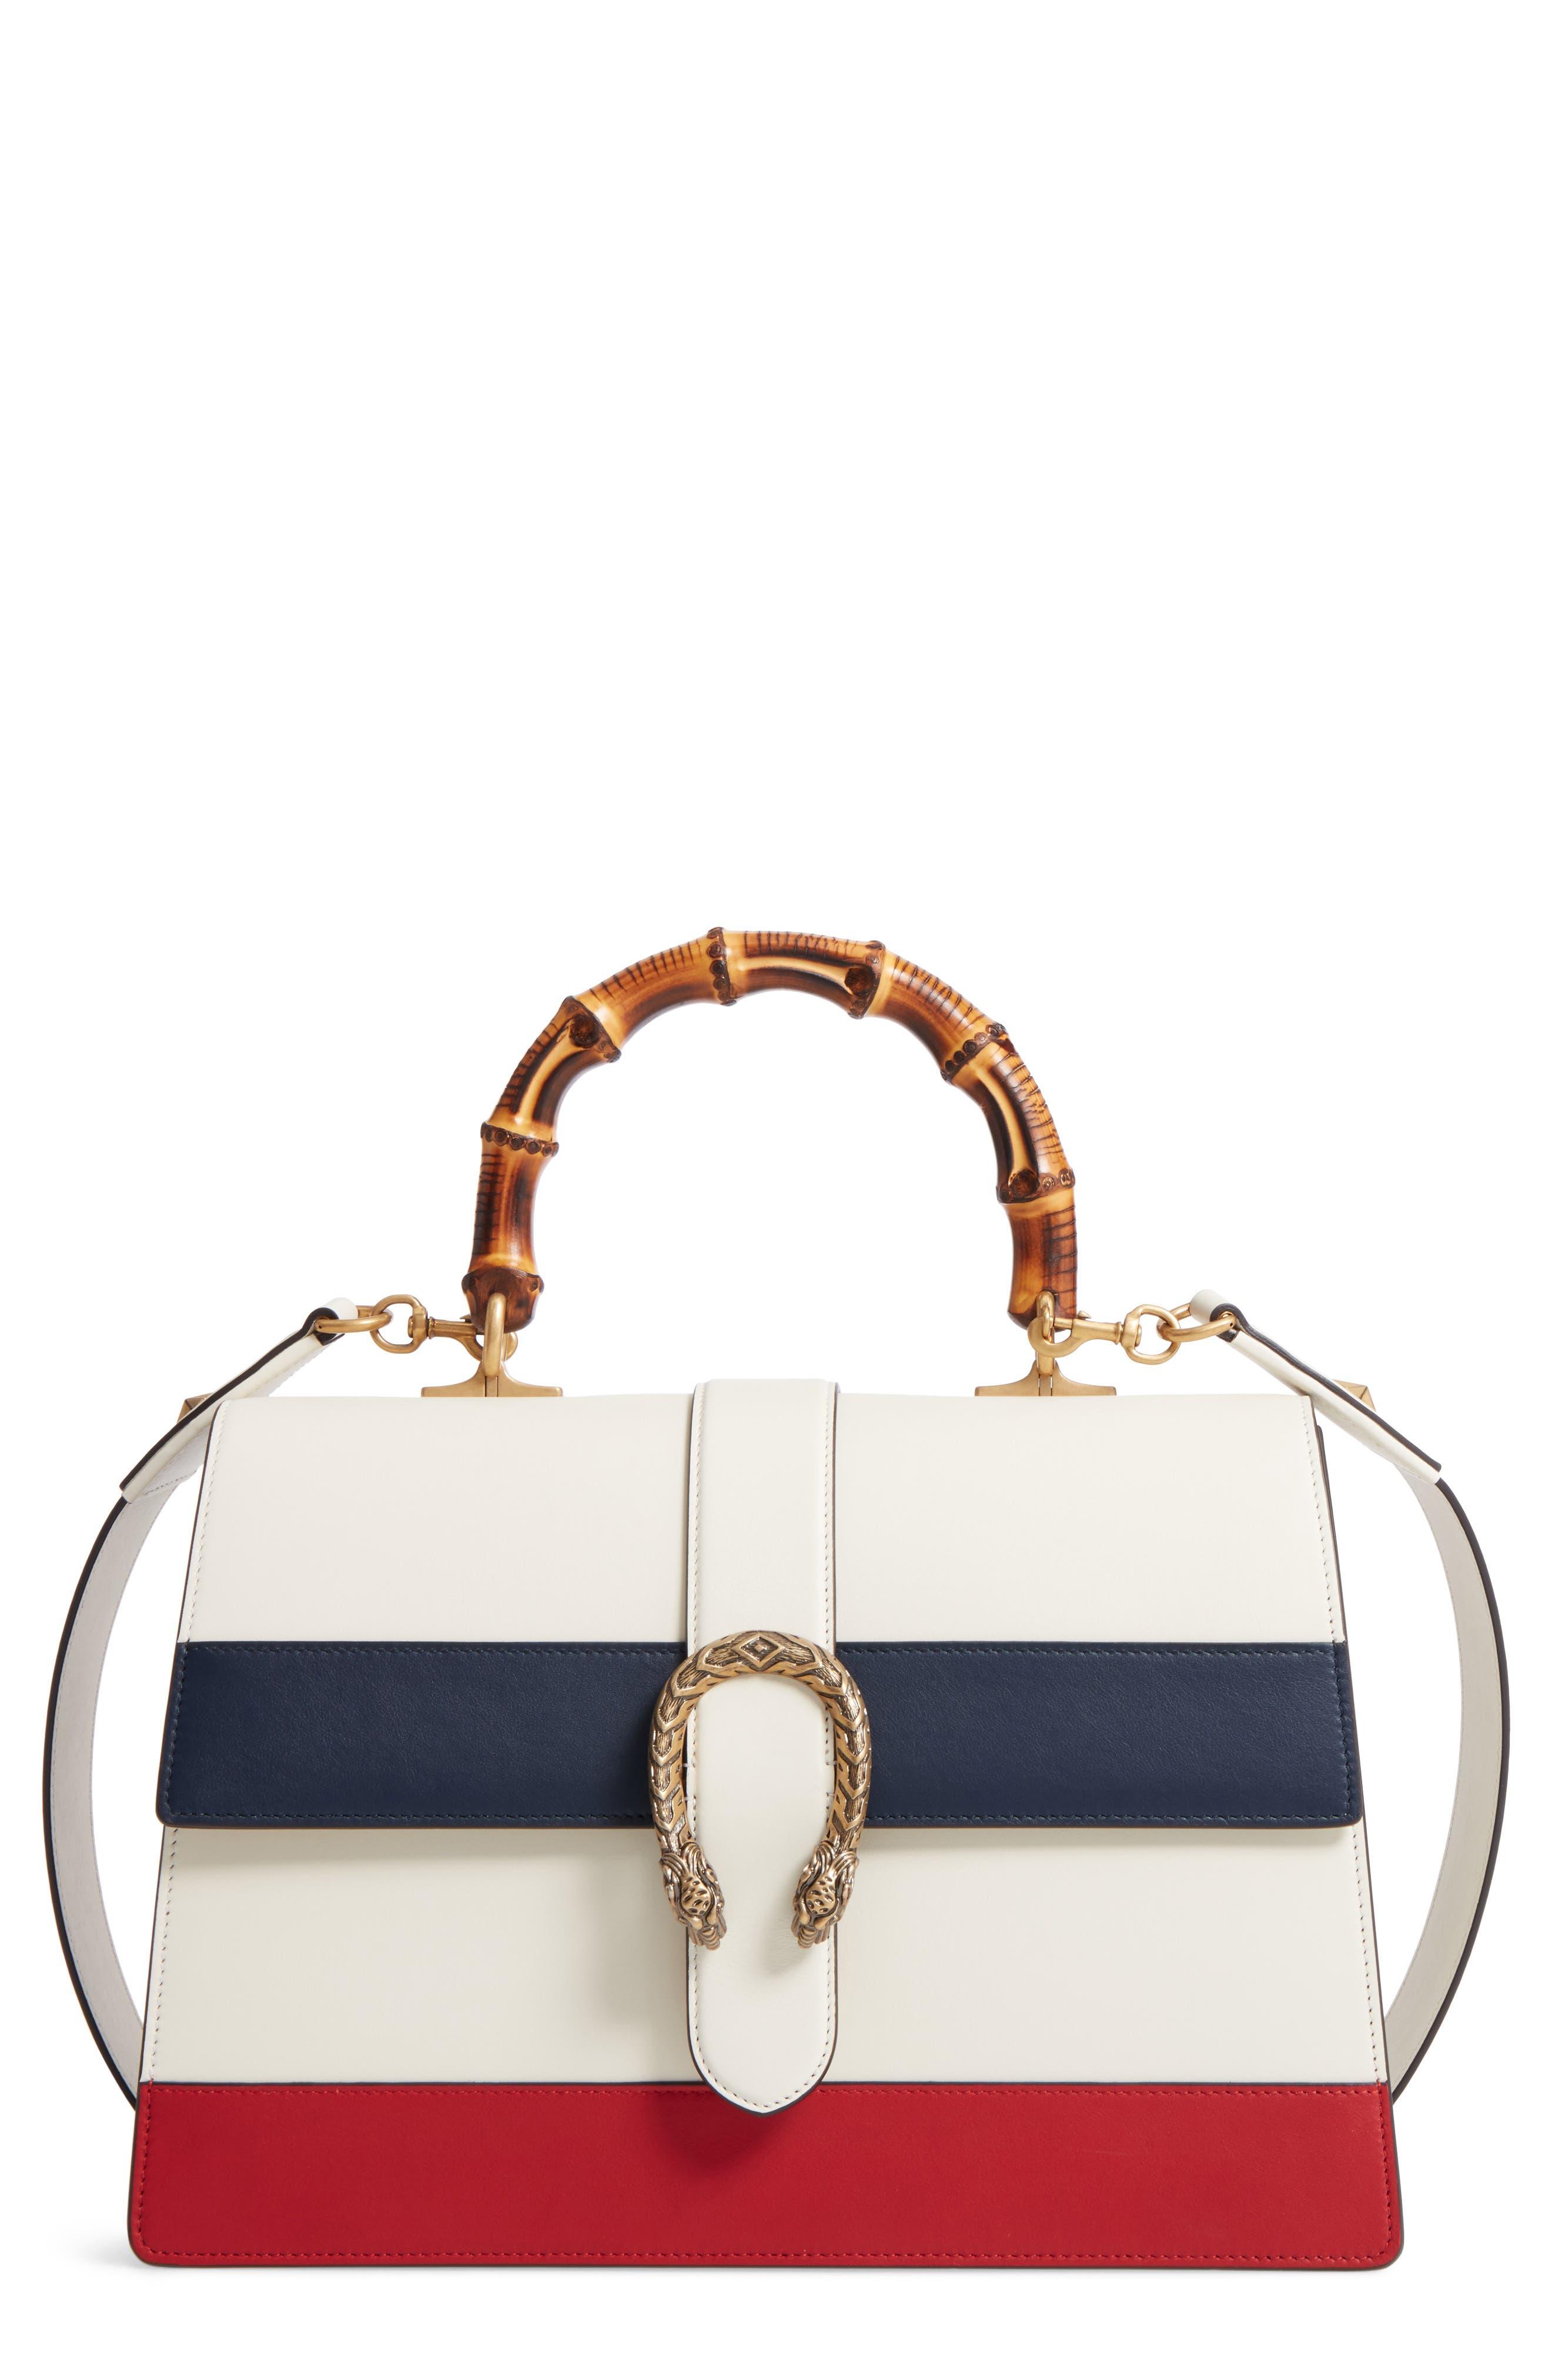 Large Dionysus Top Handle Leather Shoulder Bag,                         Main,                         color, Mystic White/ Blue/ Red